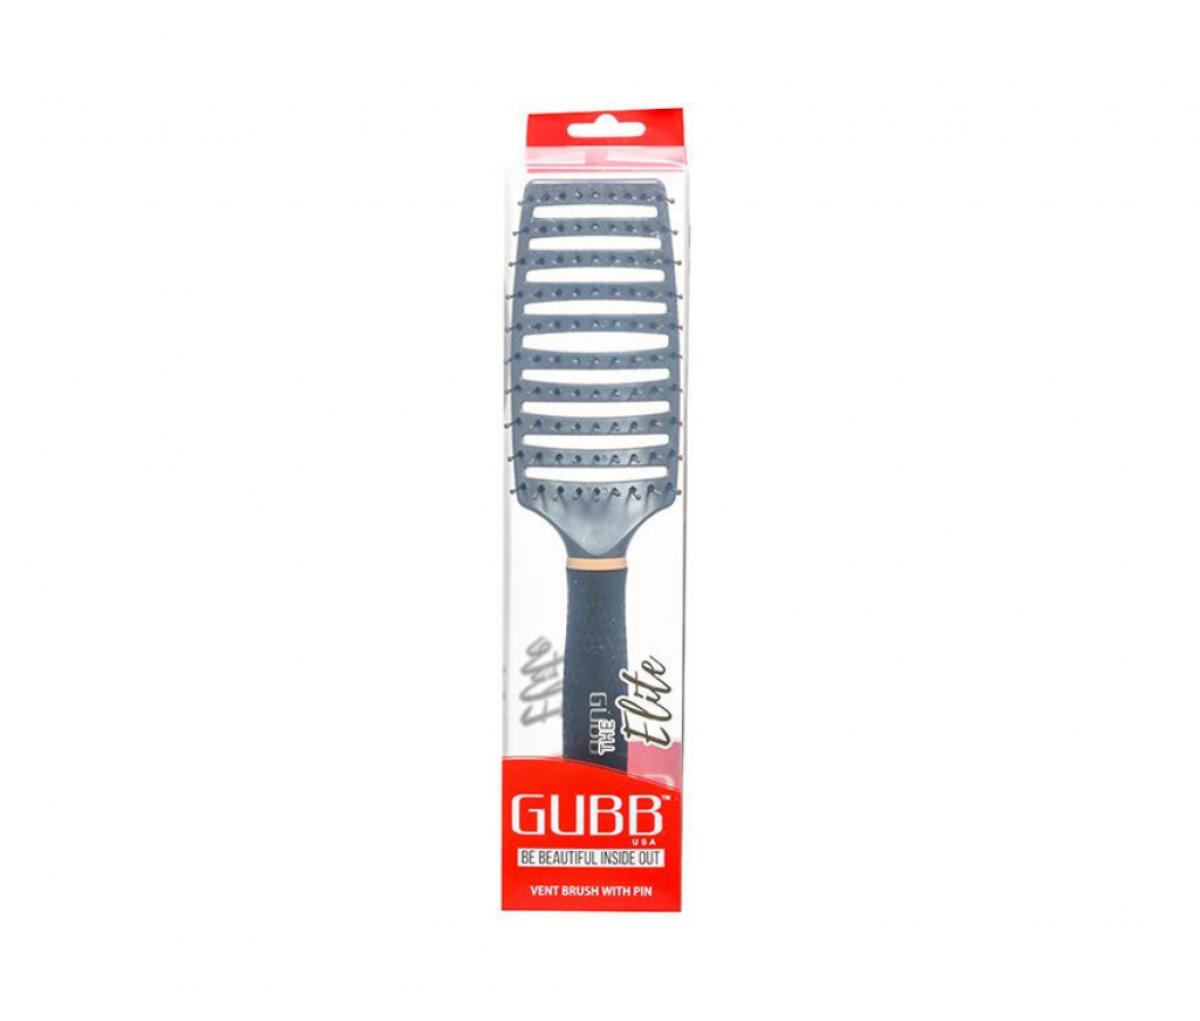 GUBB Vent Brush With Pin (Elite)